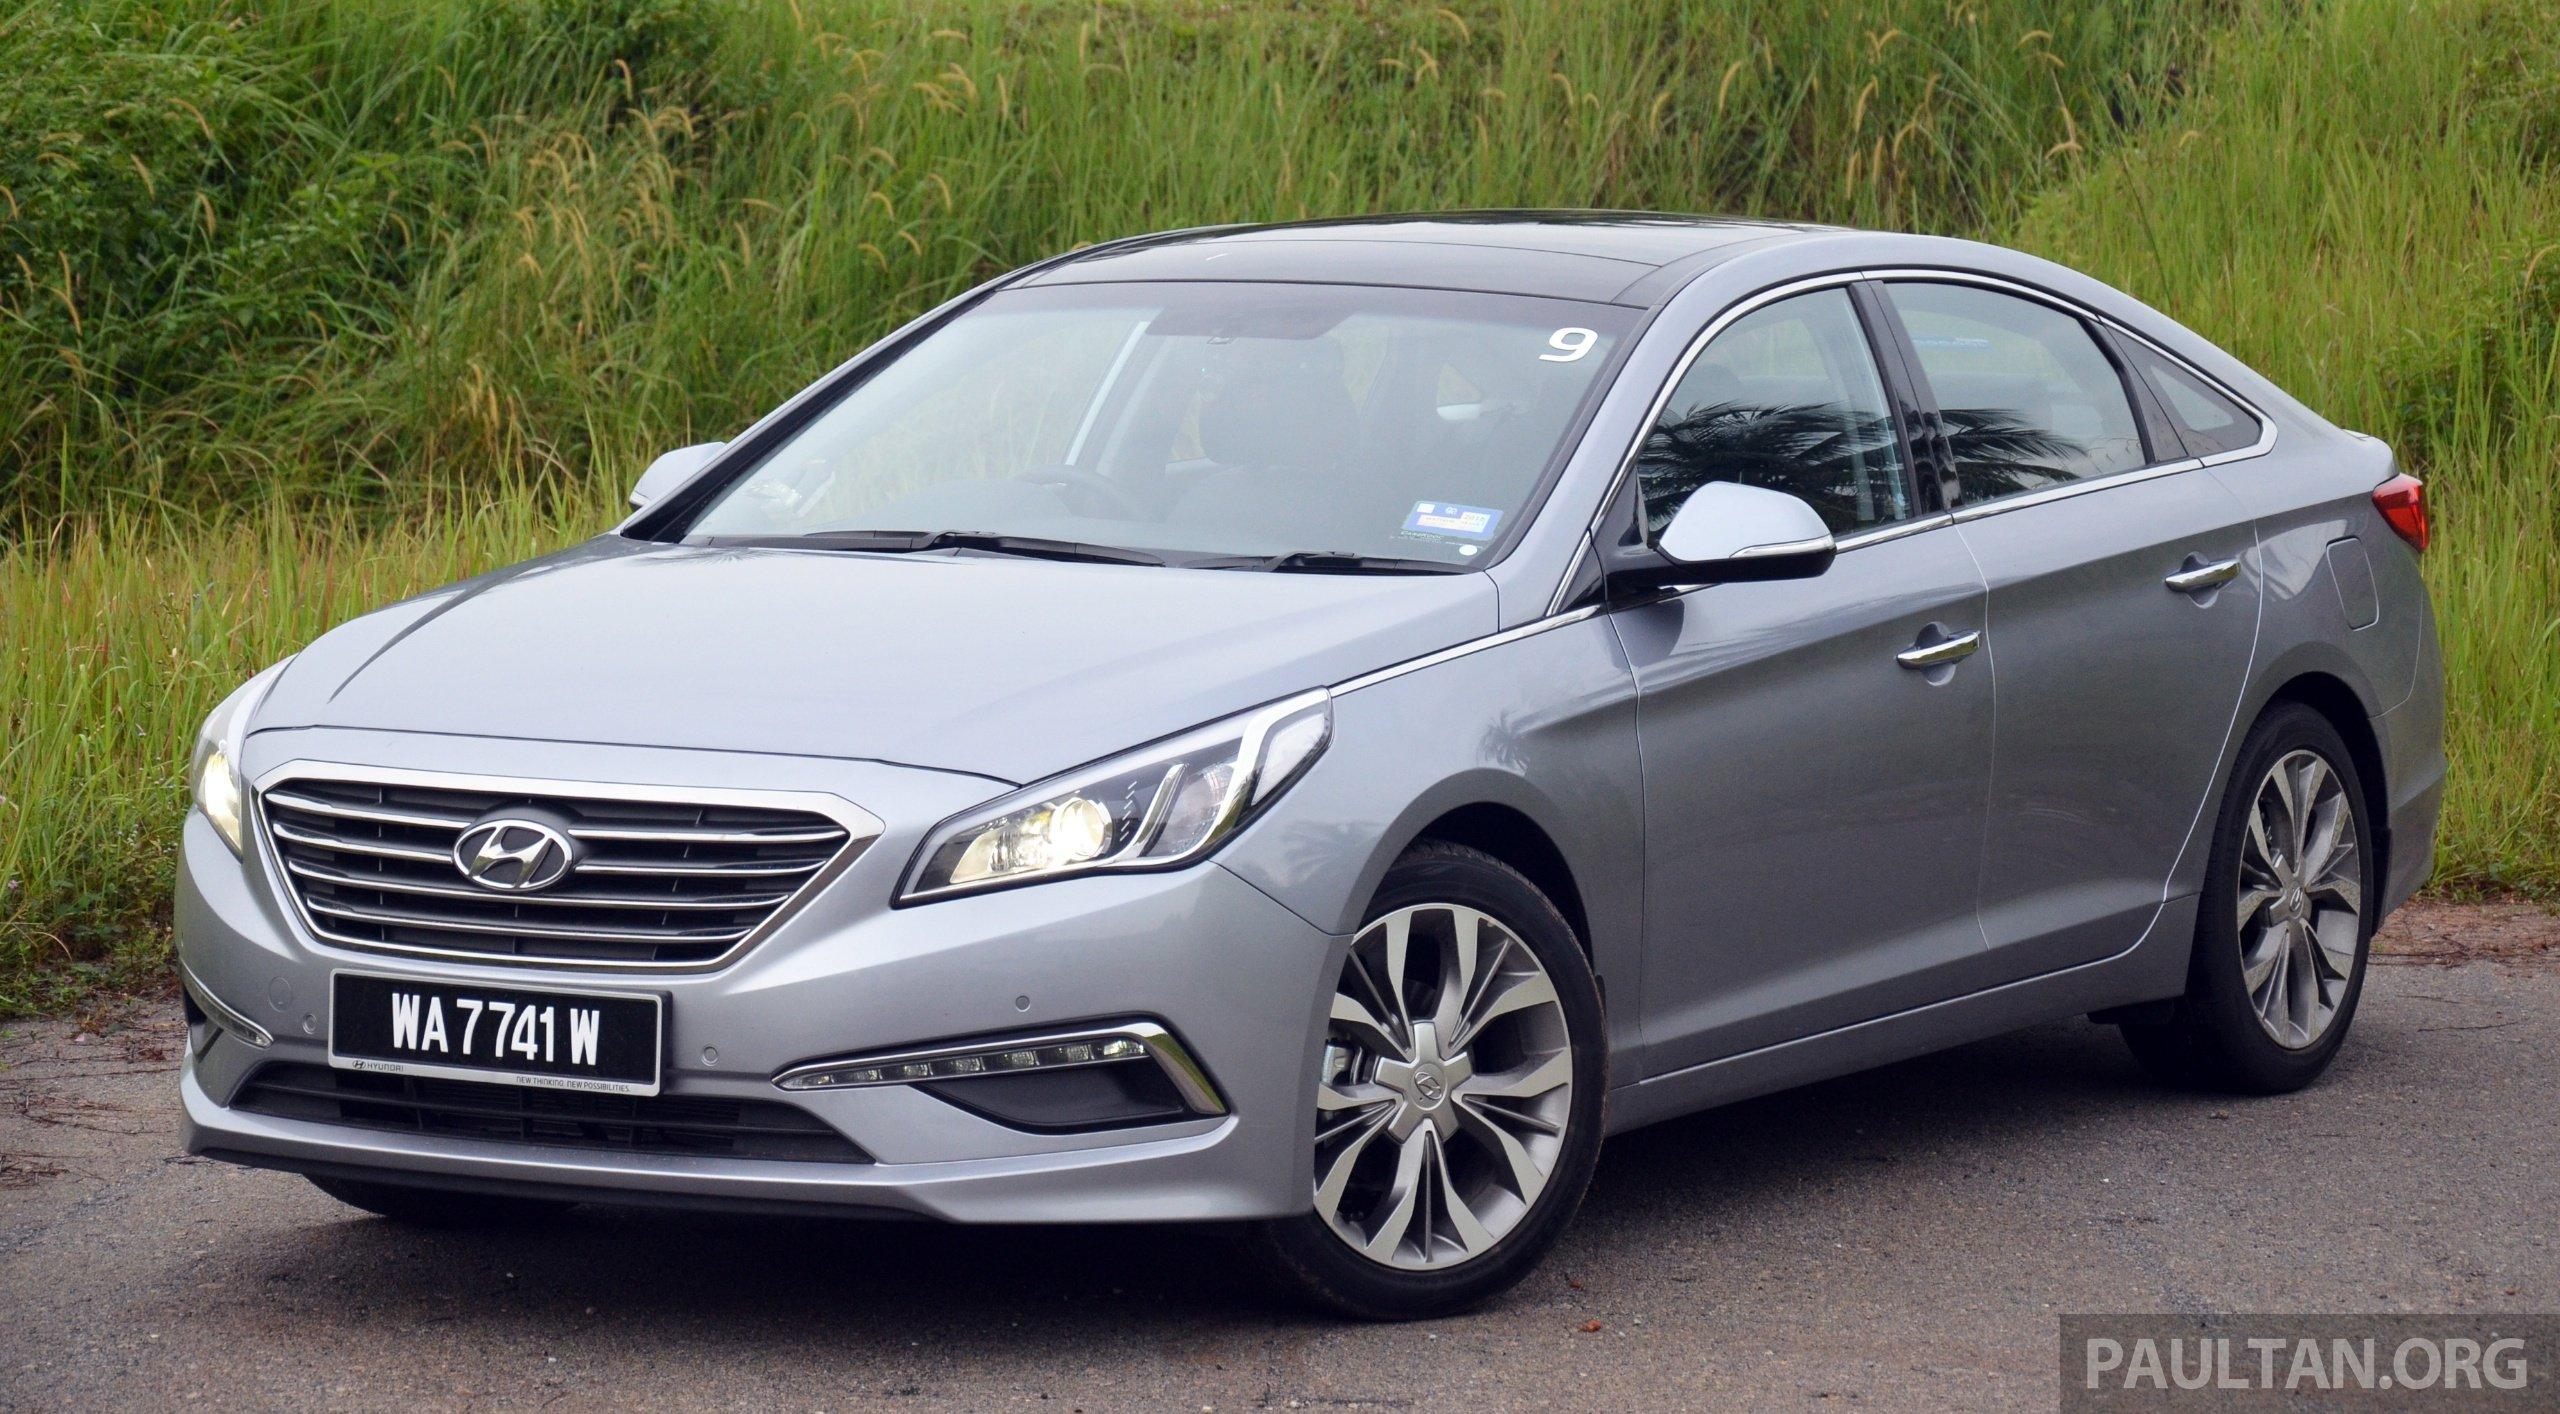 Hyundai Sonata Hybrid 2018 >> DRIVEN: Hyundai Sonata LF 2.0 Executive tested Image 301420